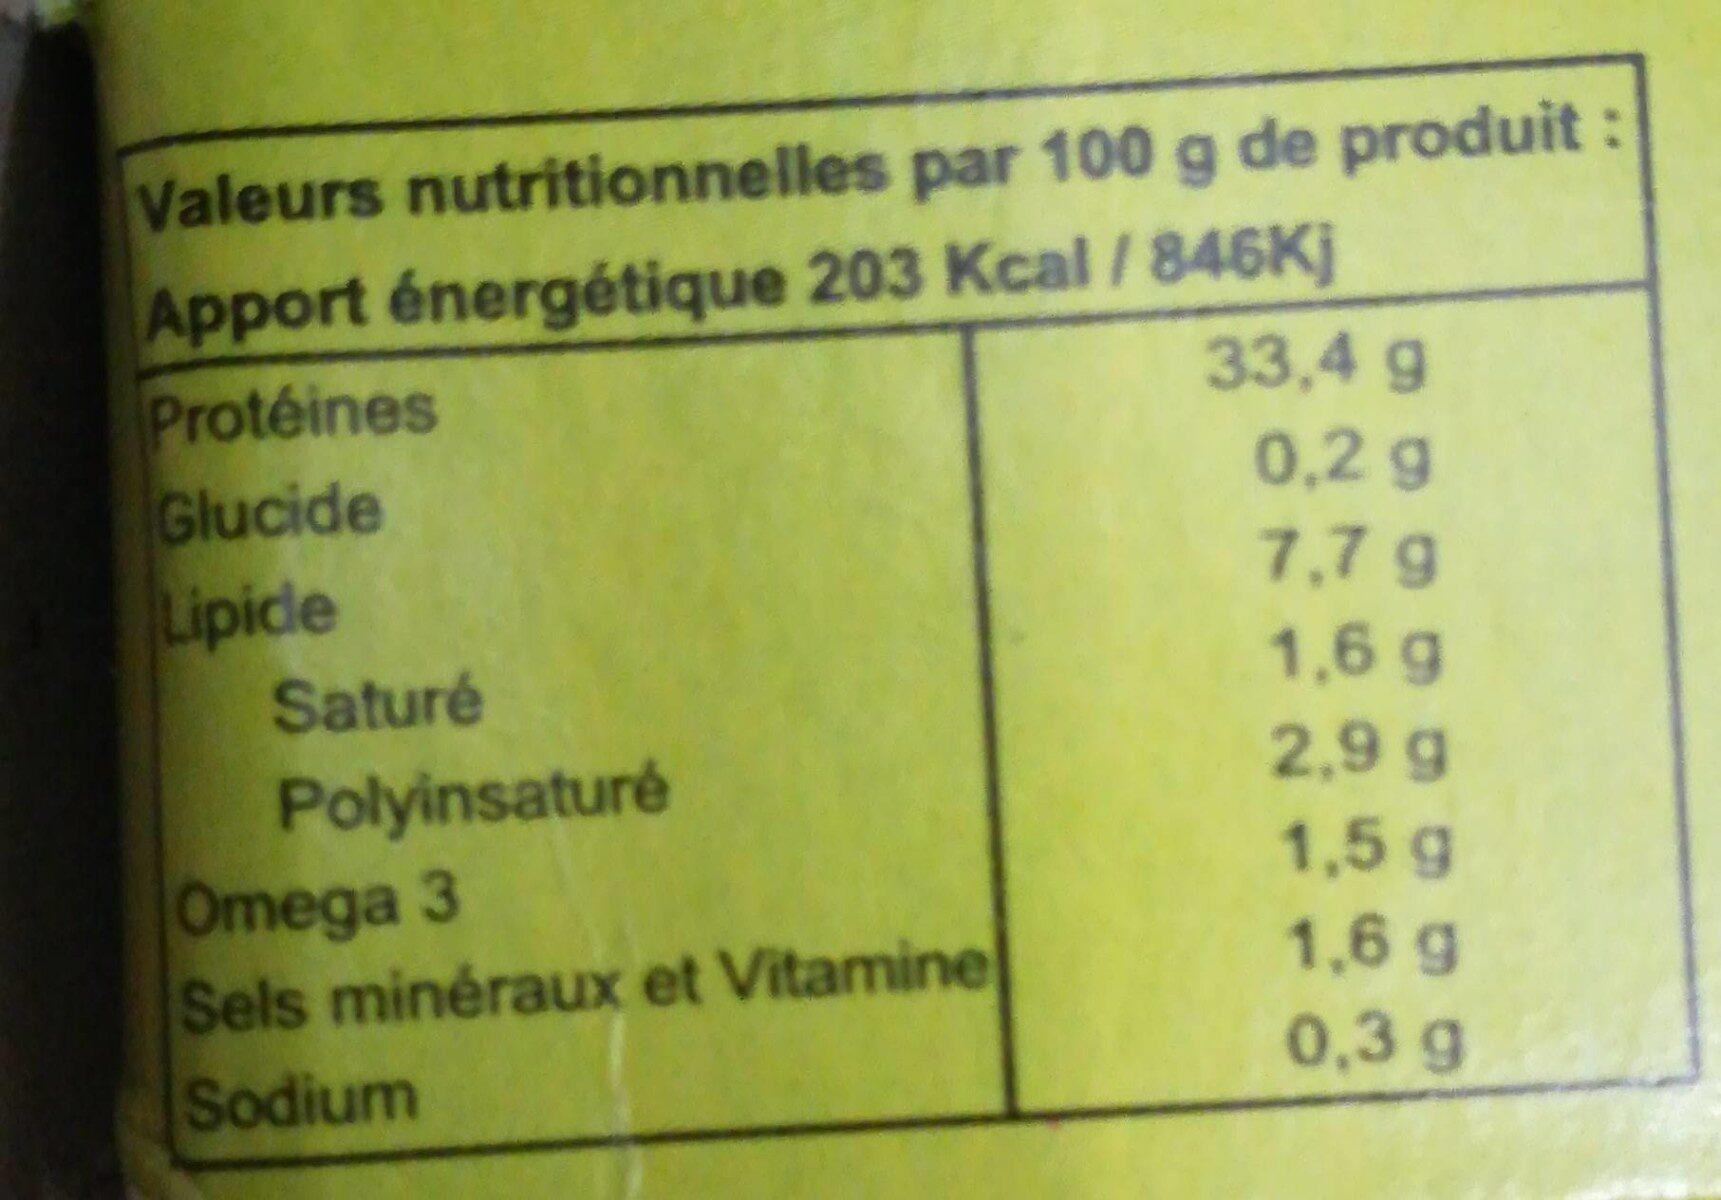 Sepia Filletes Of Mackerel In Oil - Informations nutritionnelles - fr